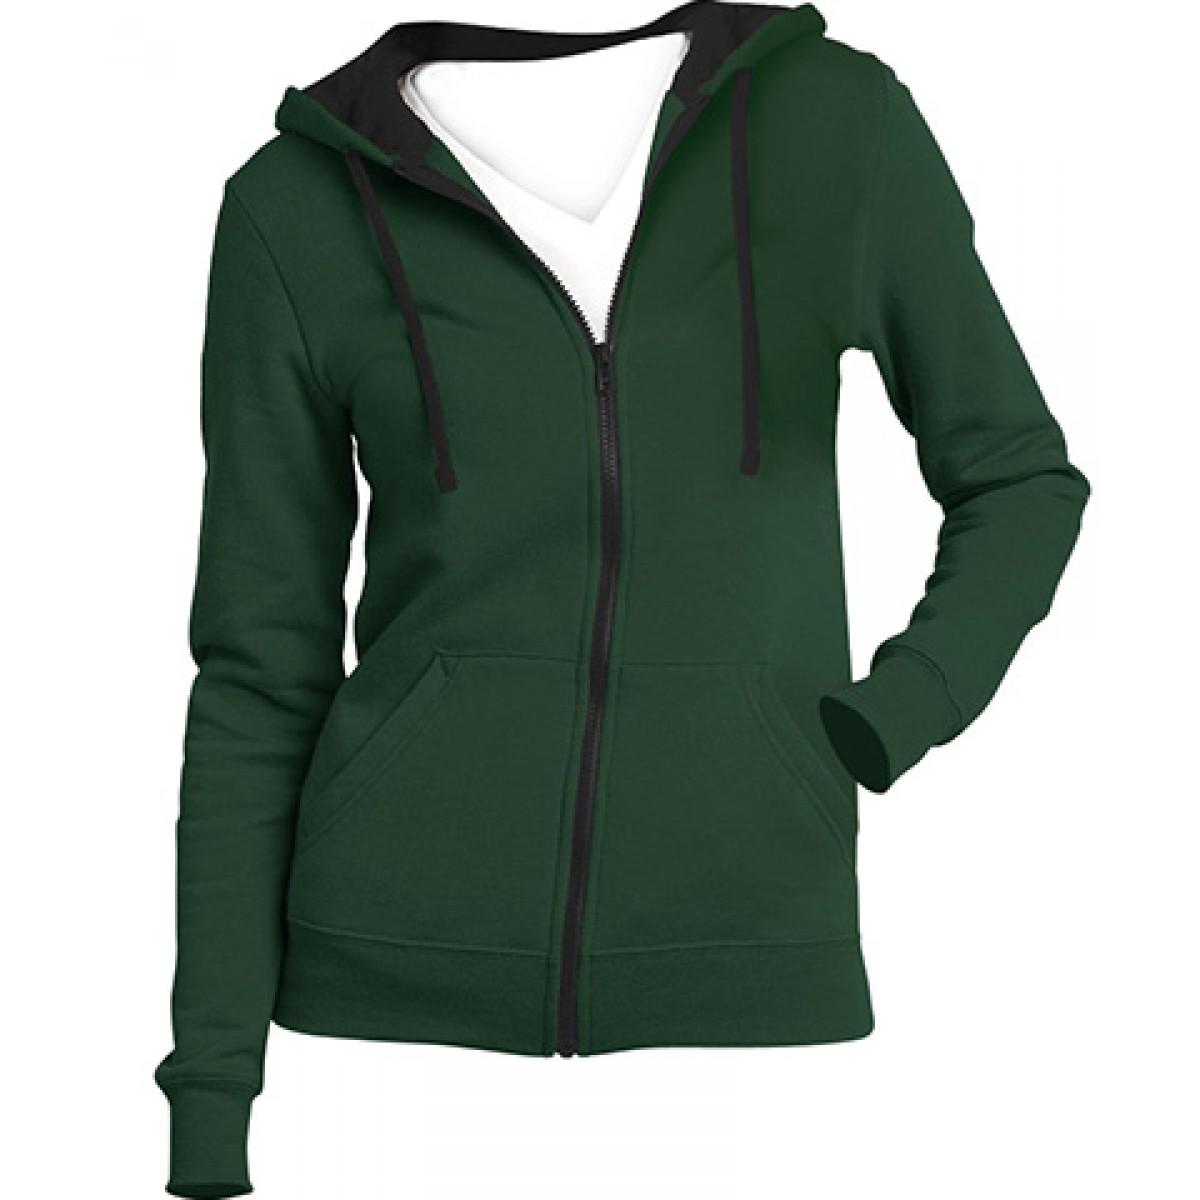 Juniors Full-Zip Hoodie-Green-3XL